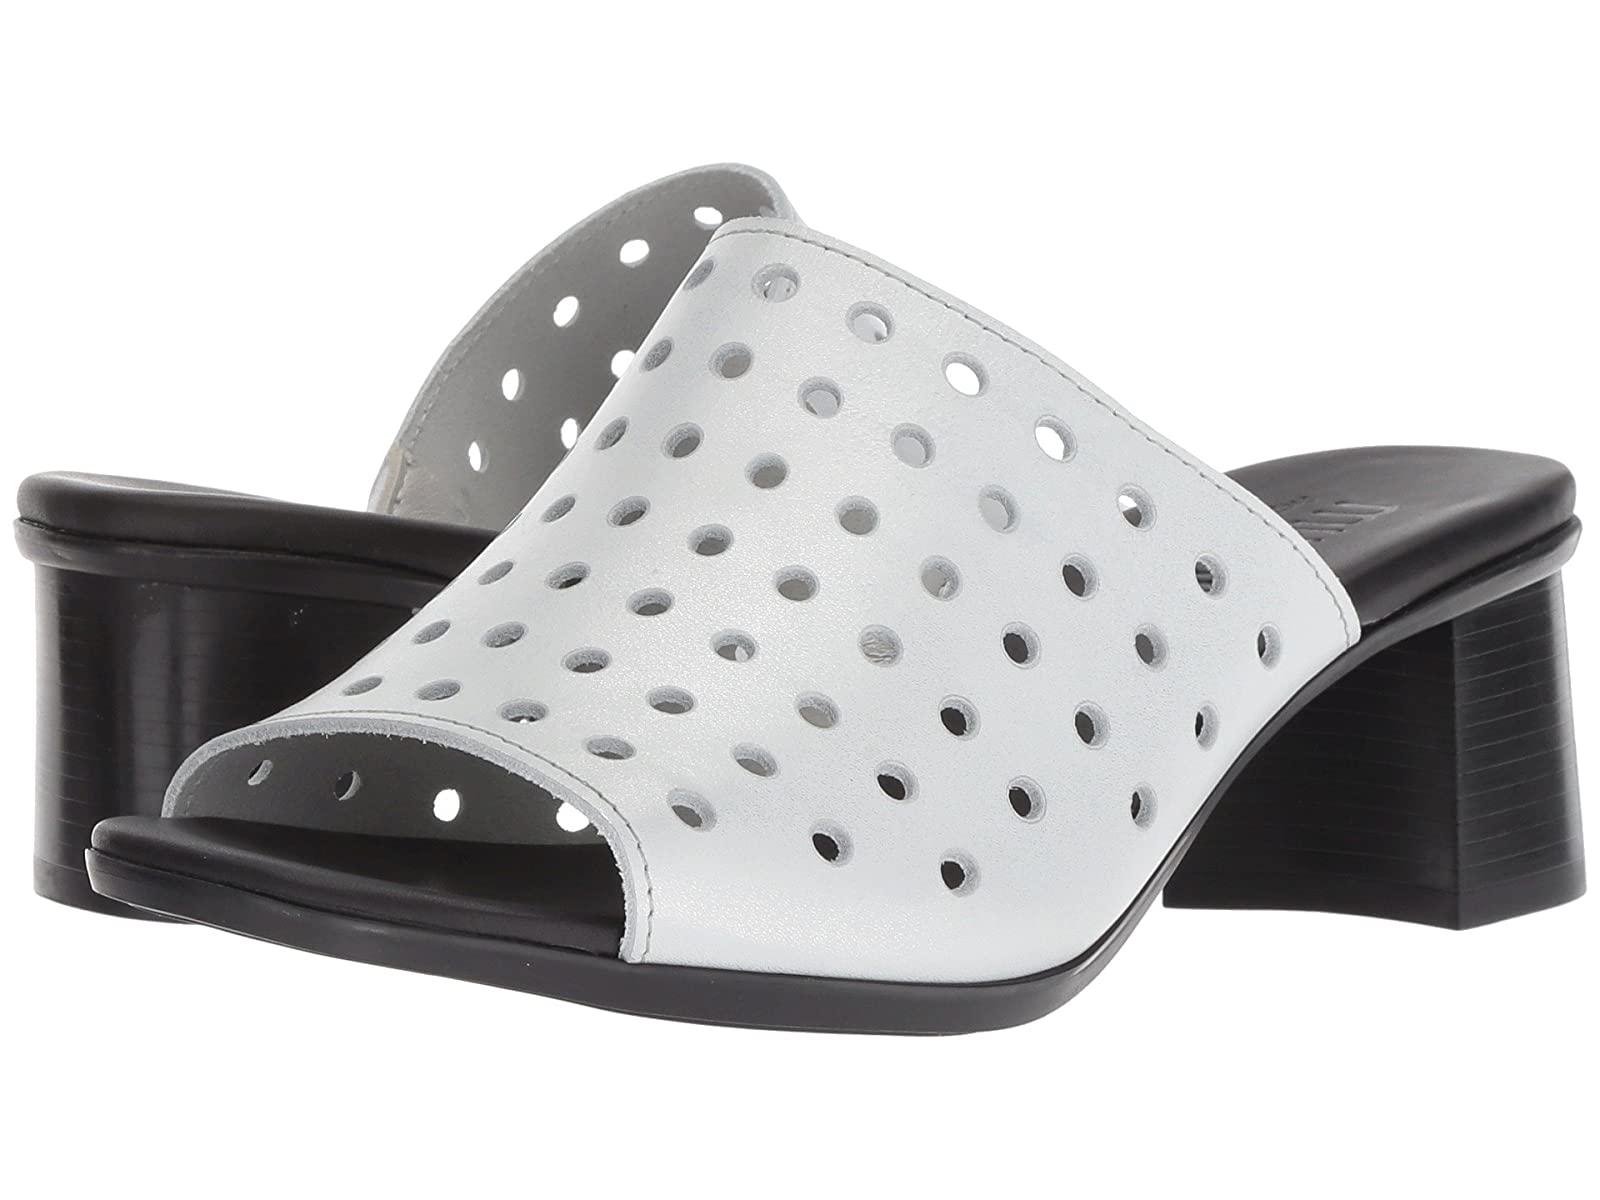 Munro JulesAtmospheric grades have affordable shoes